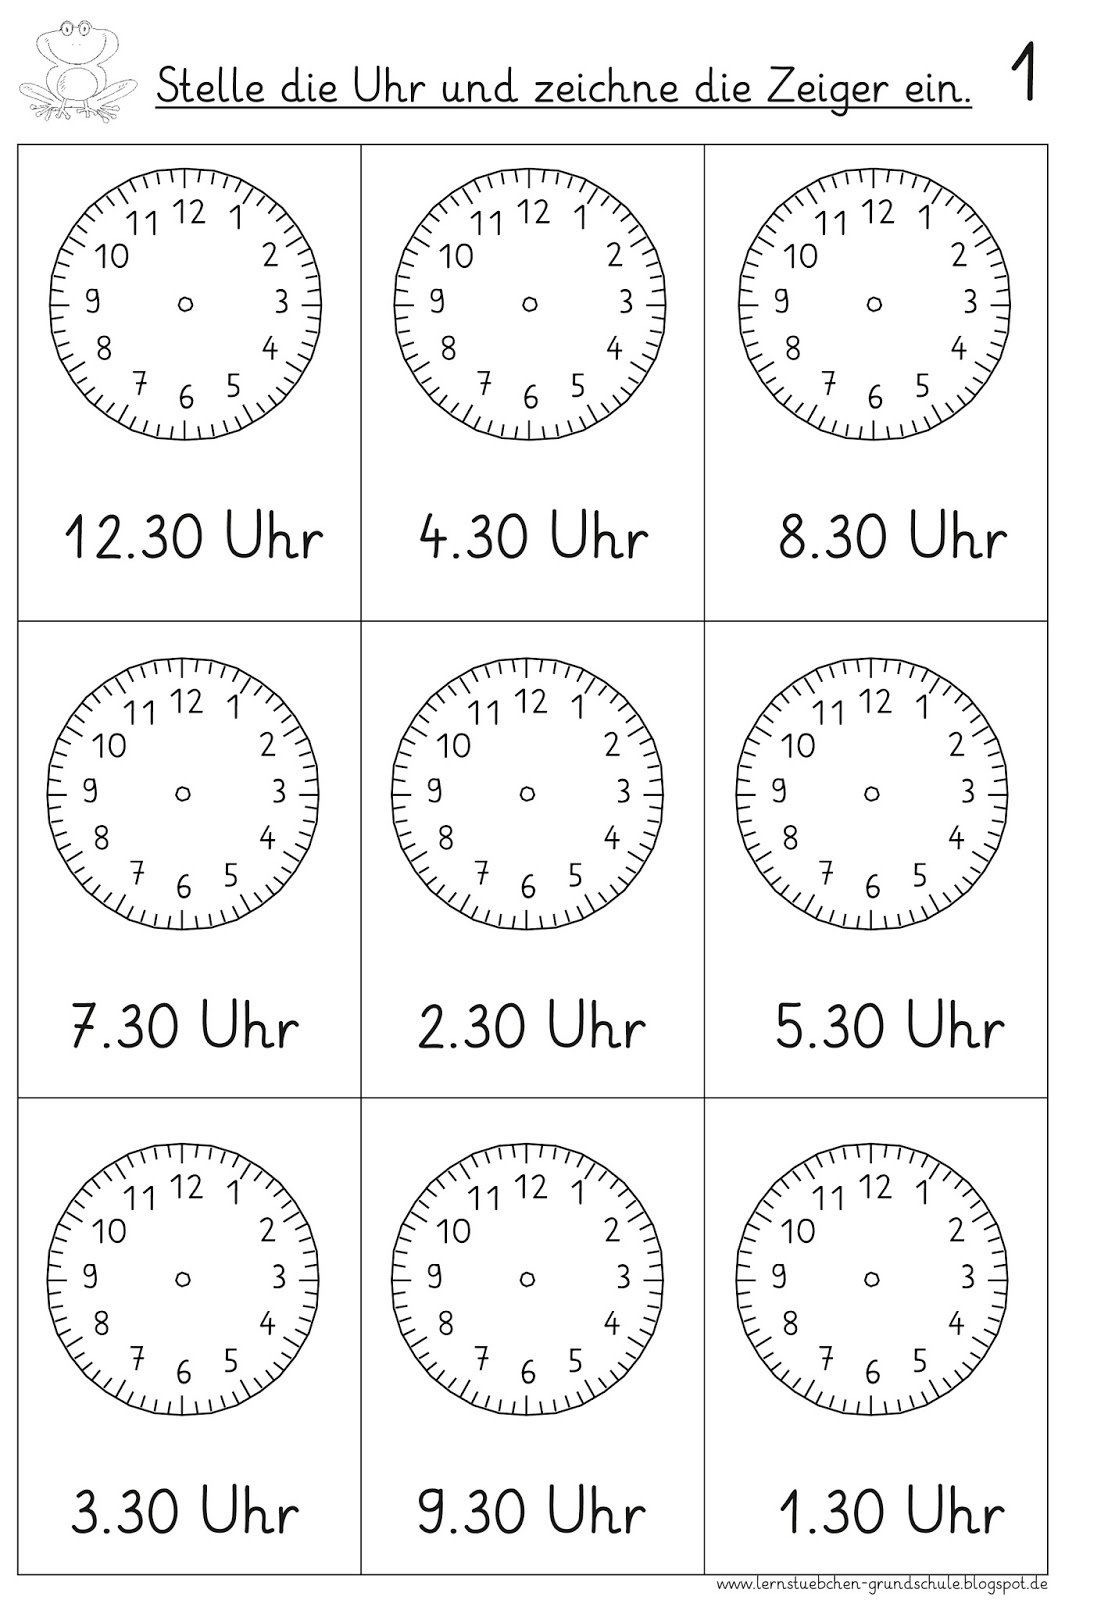 Arbeitsblatt Uhr Grundschule : Arbeitsblatt vorschule arbeitsblätter uhr klasse